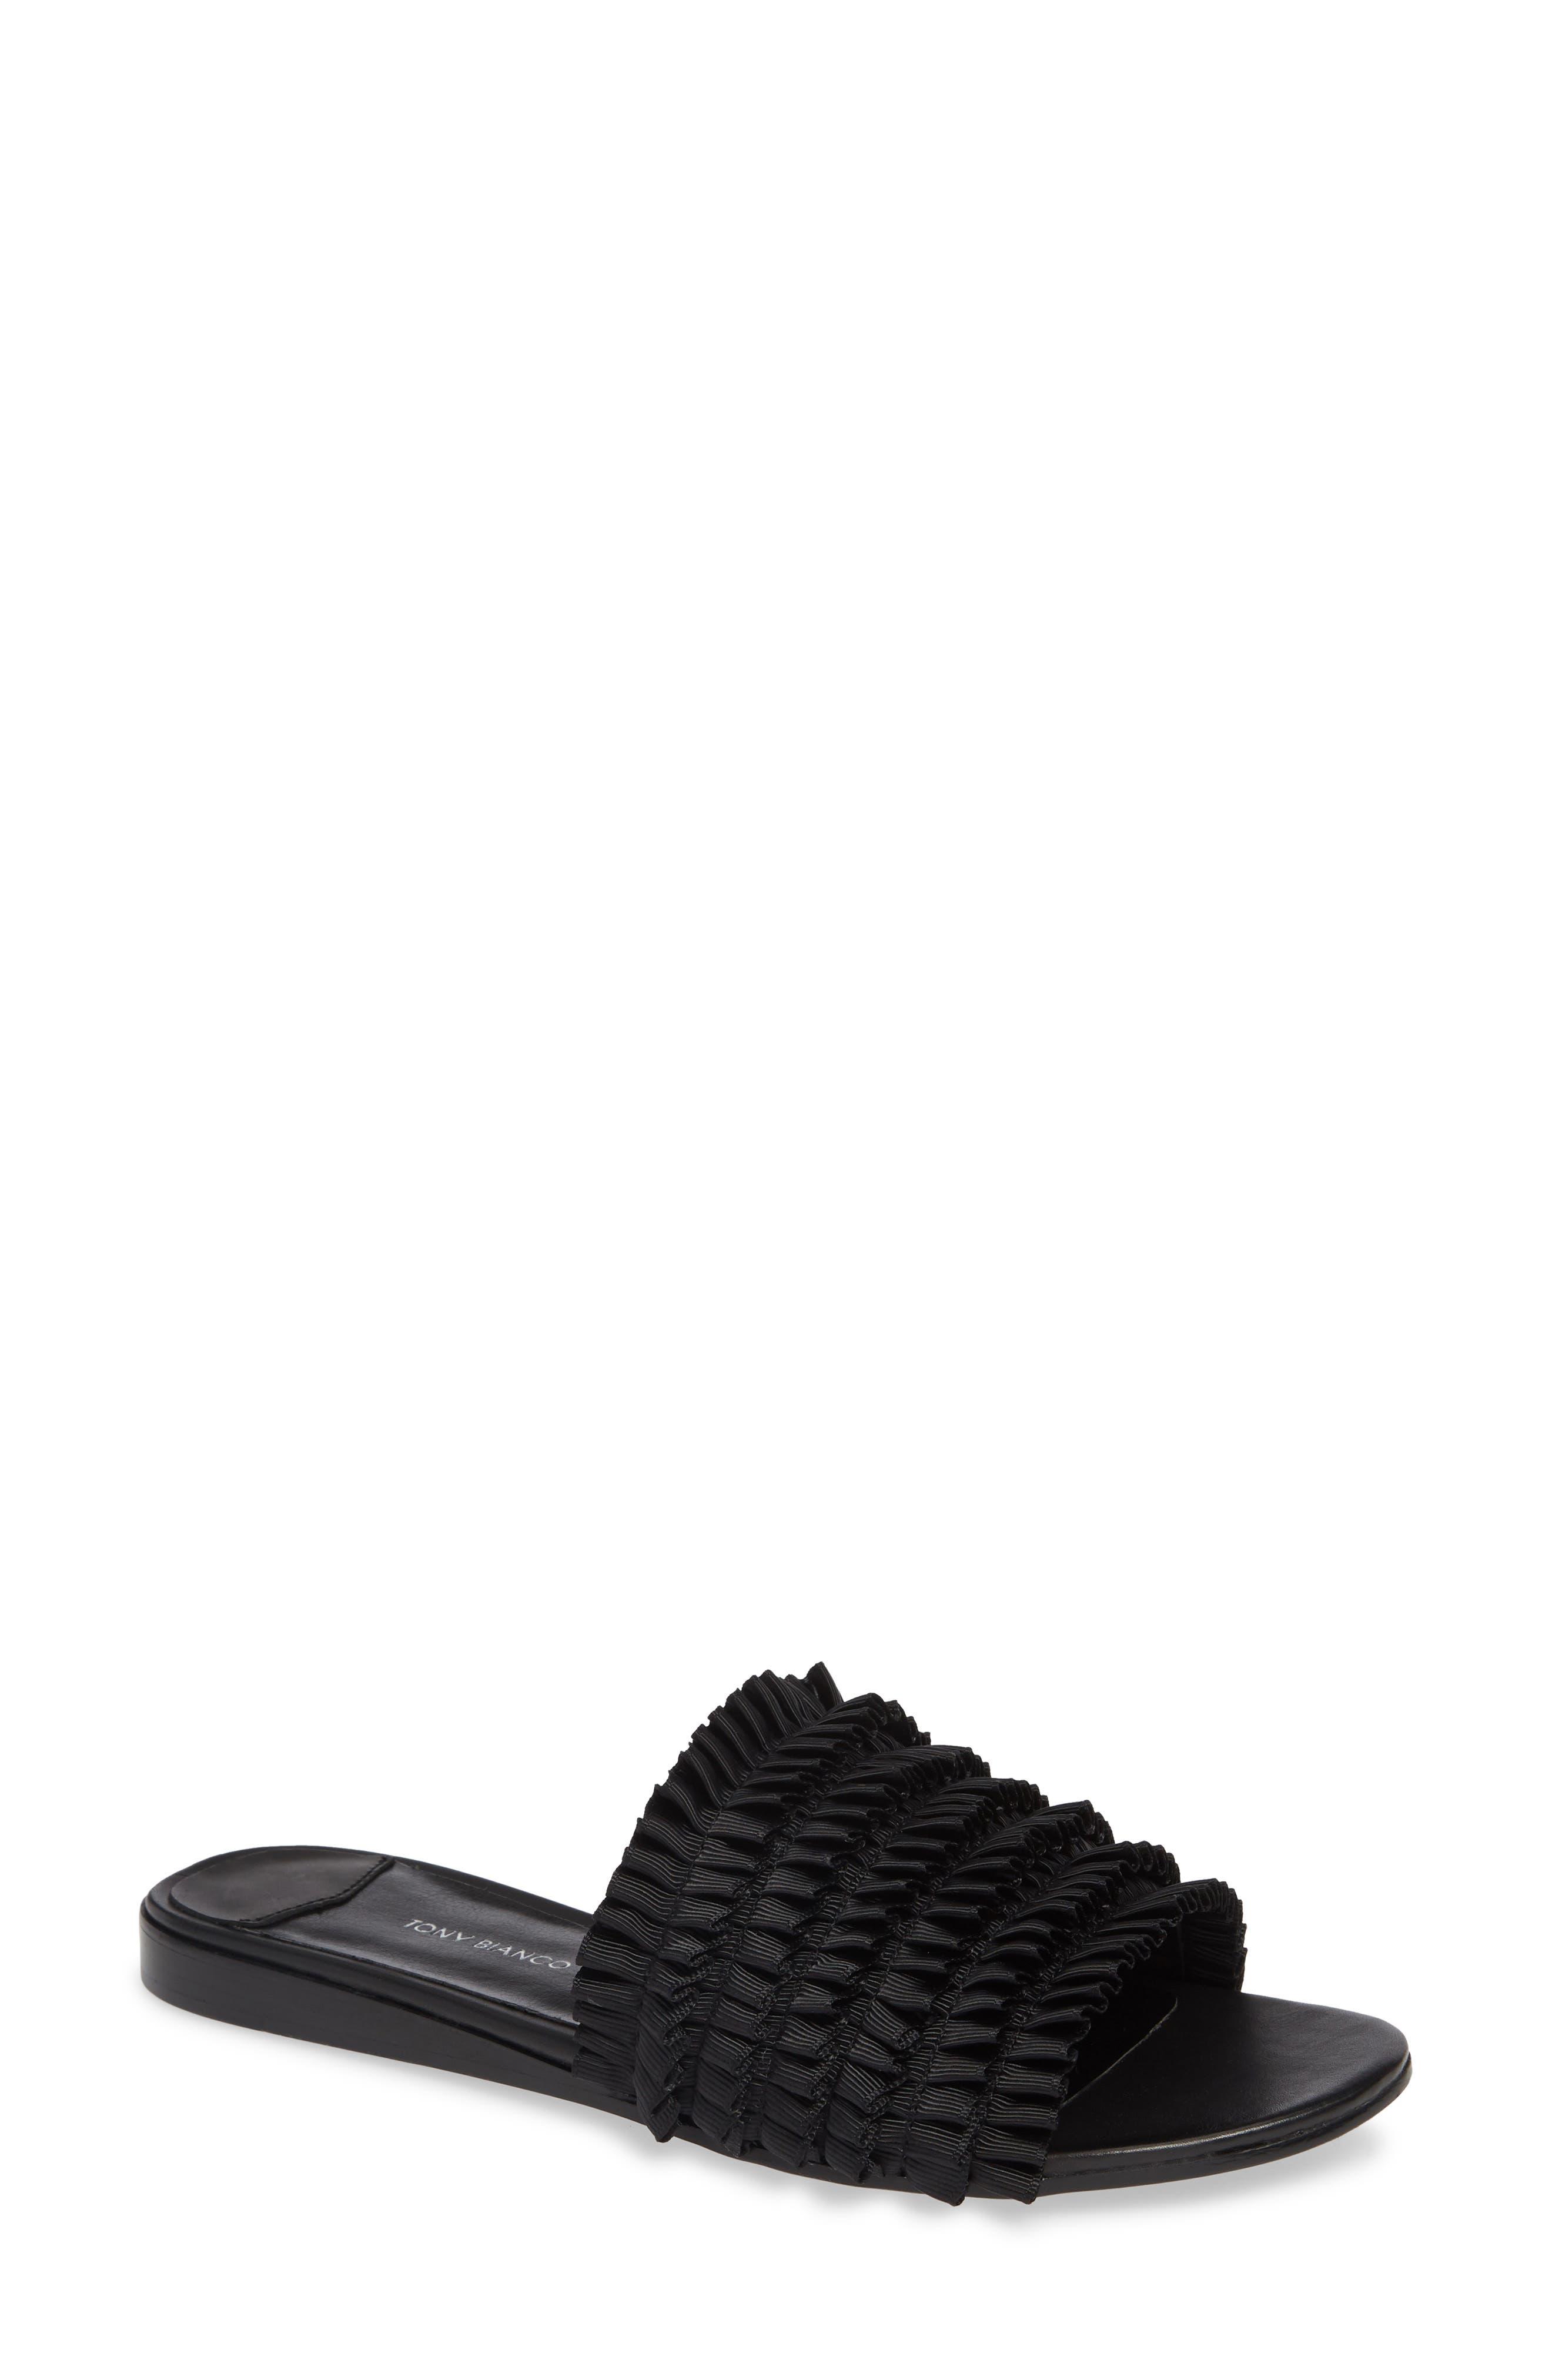 Tony Bianco Jerzy Slide Sandal, Black